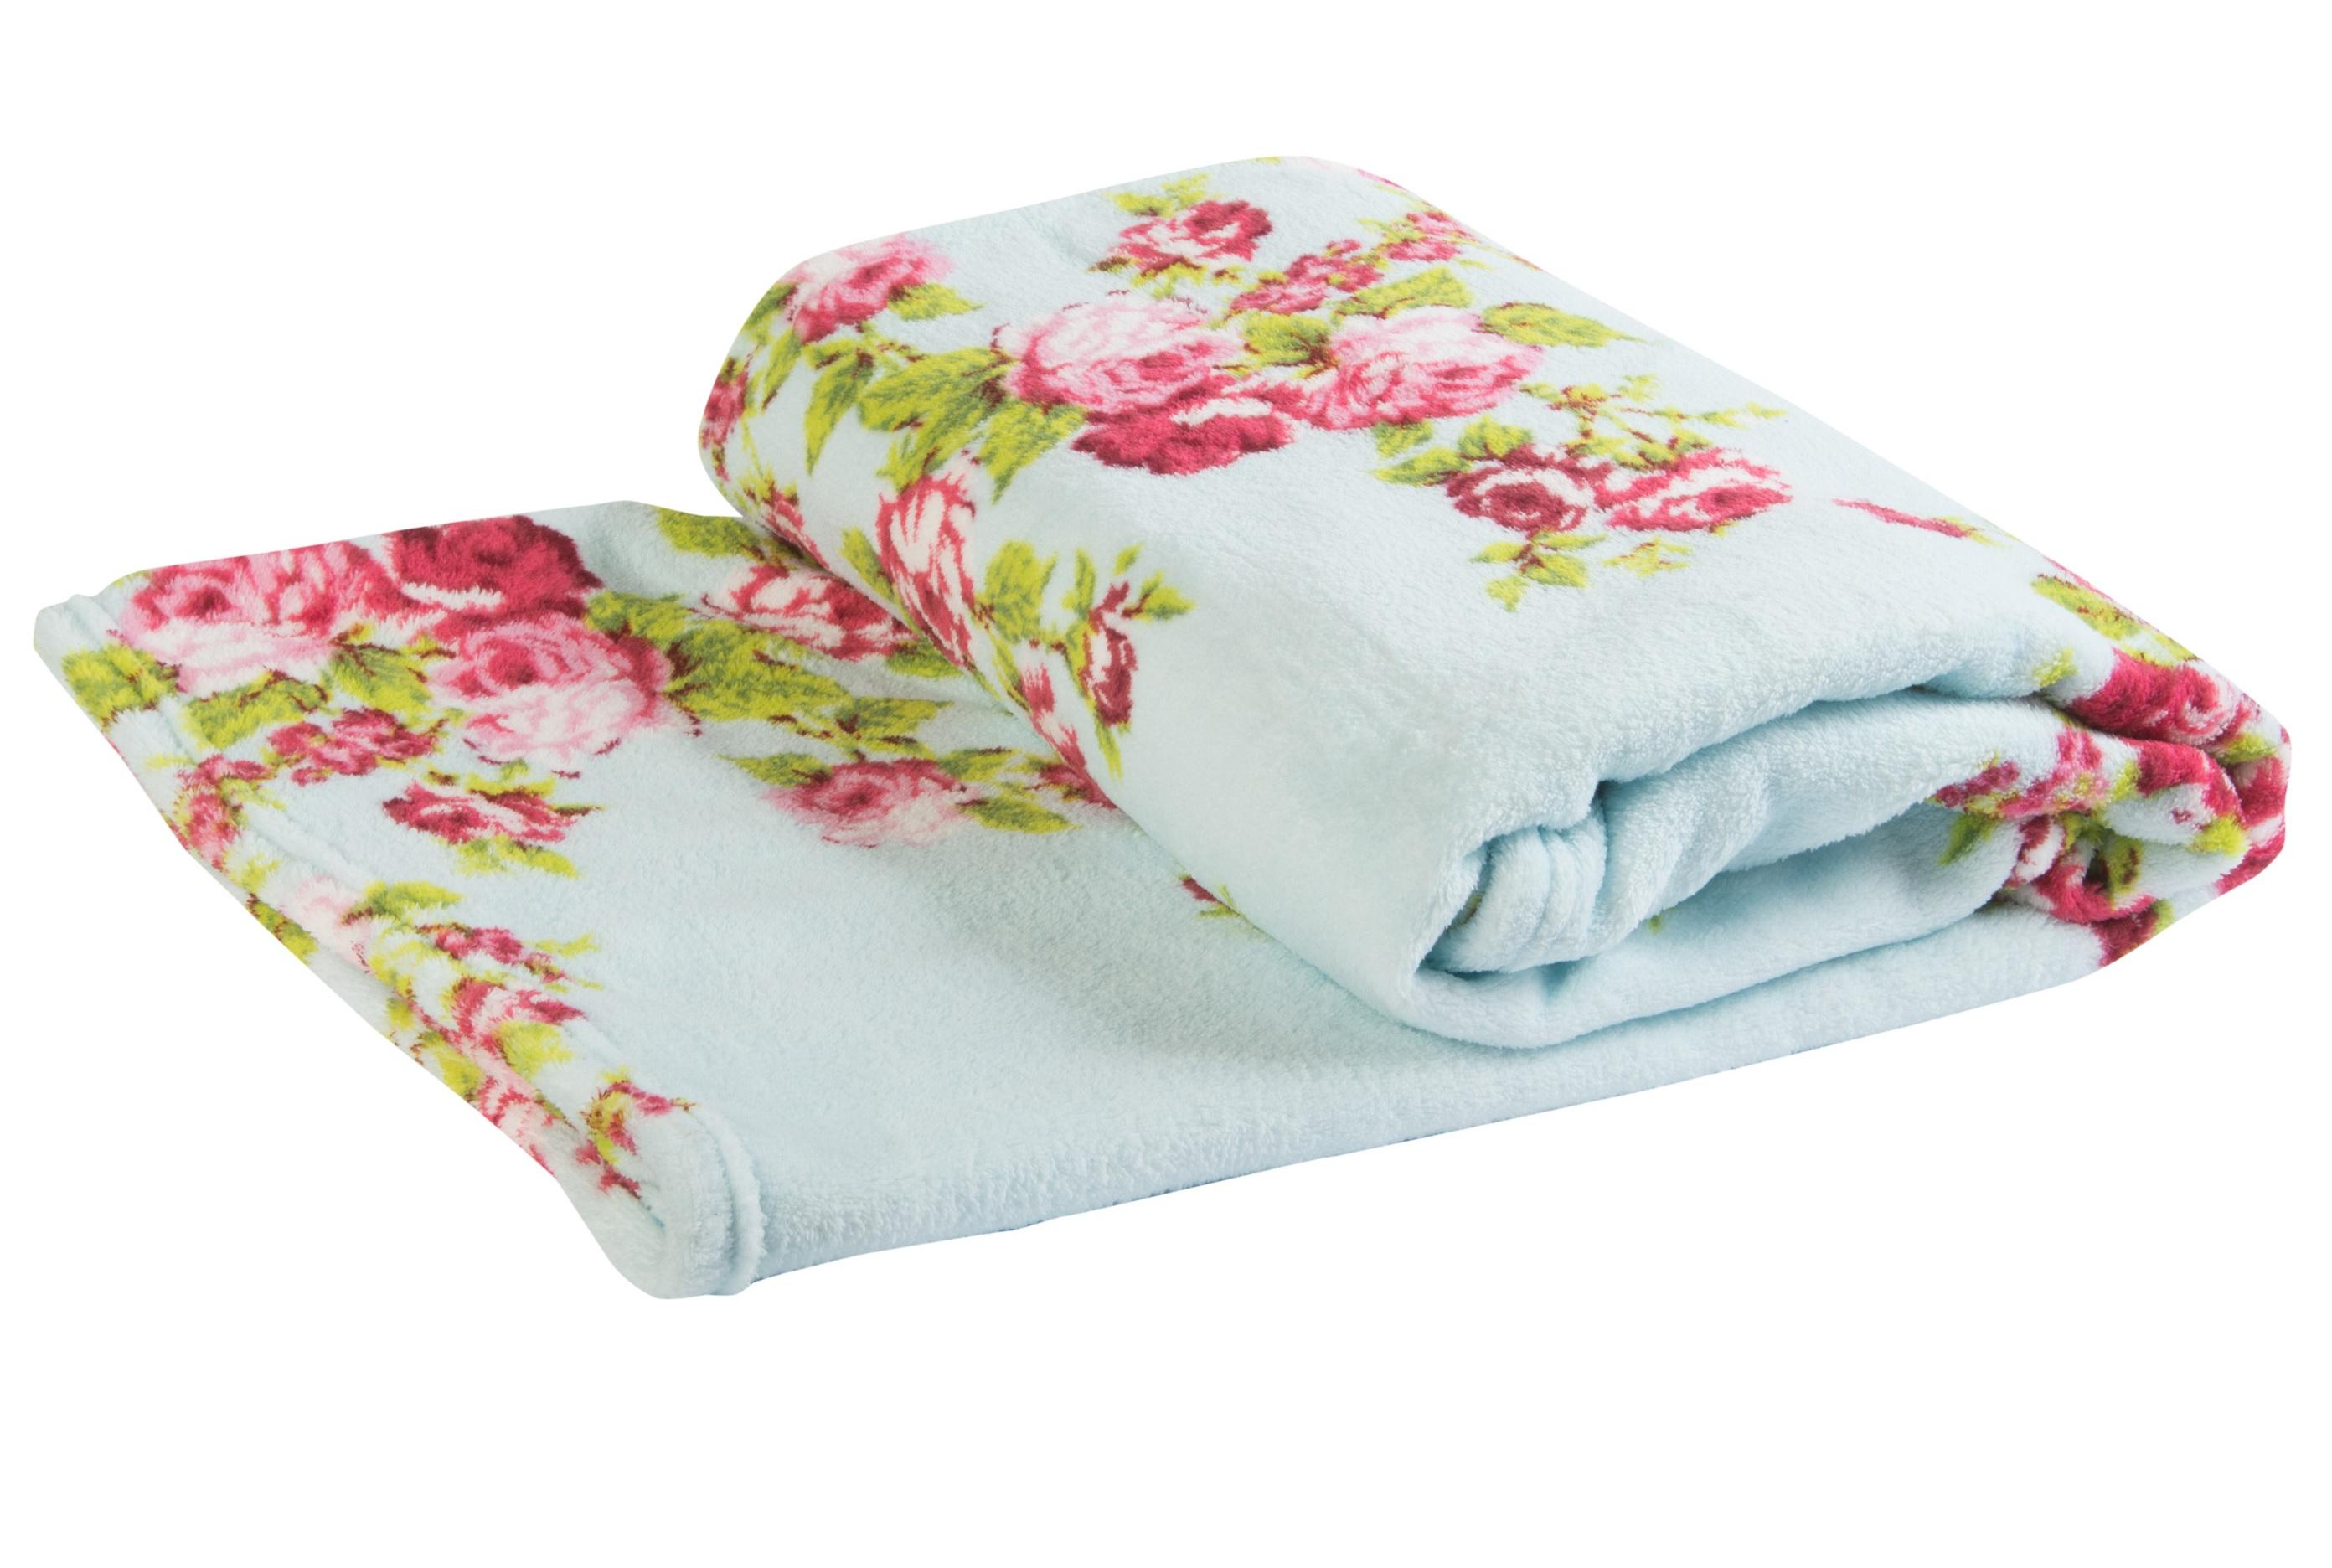 Mara Vintage Fl Soft C Fleece Blanket Cosy Bed Sofa Throw 140cm X 180cm